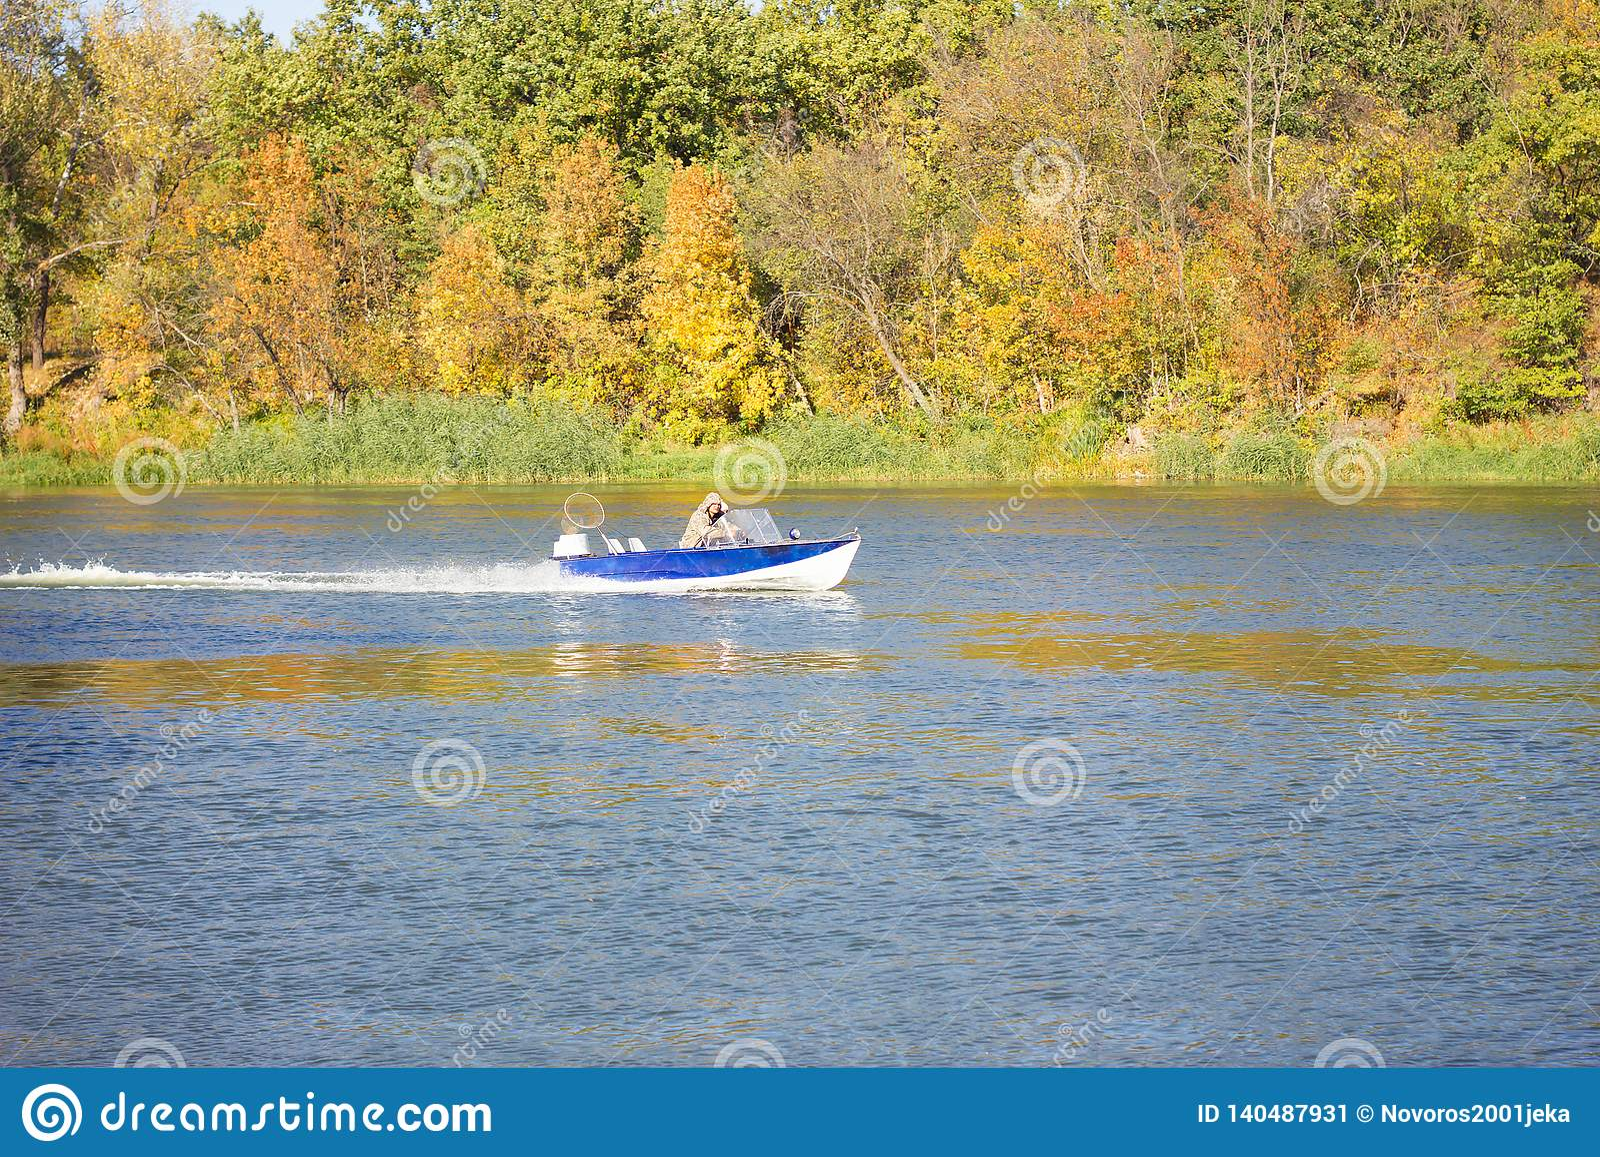 Un bote pequeño flota encendido